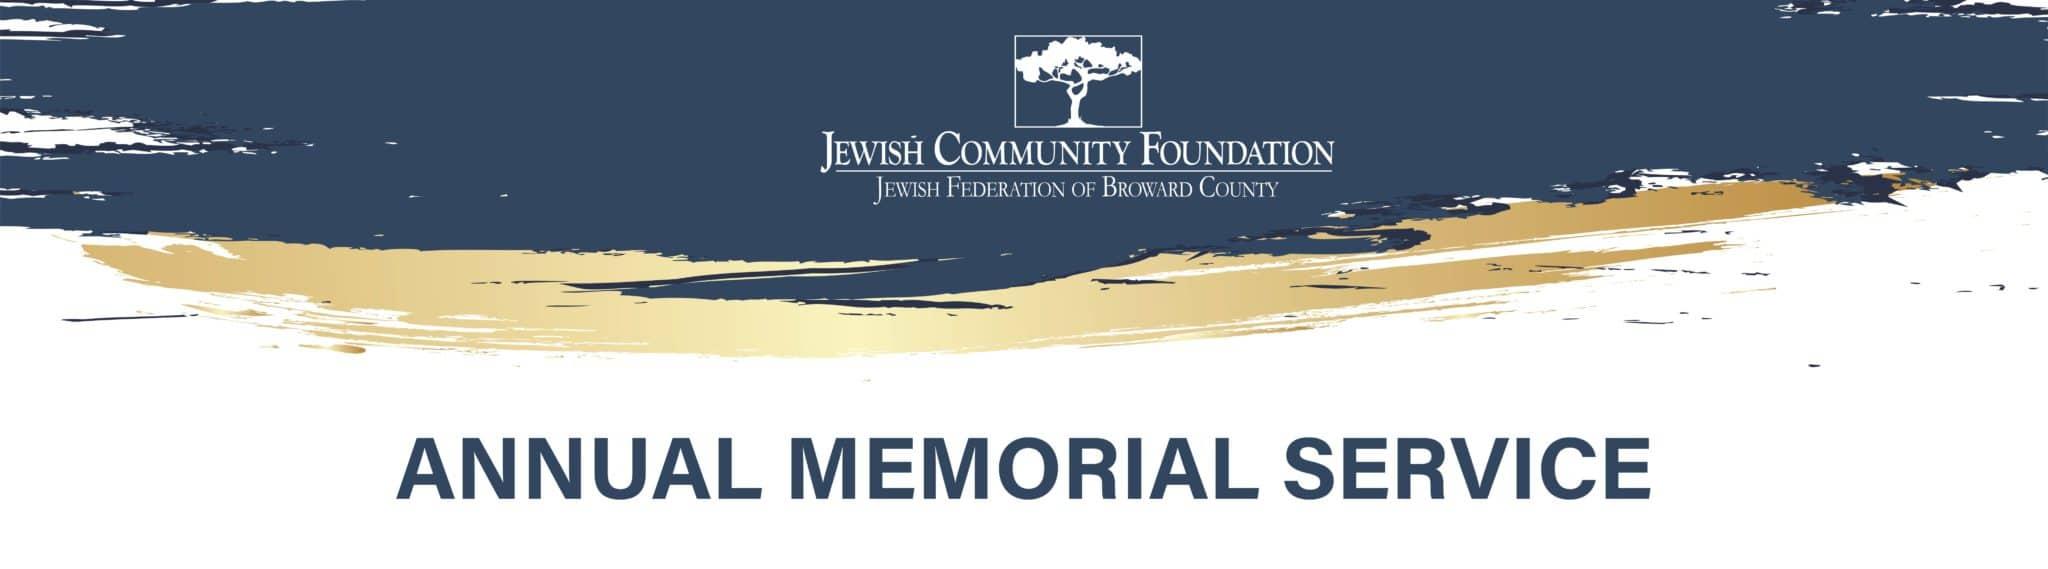 Annual Memorial Service 01